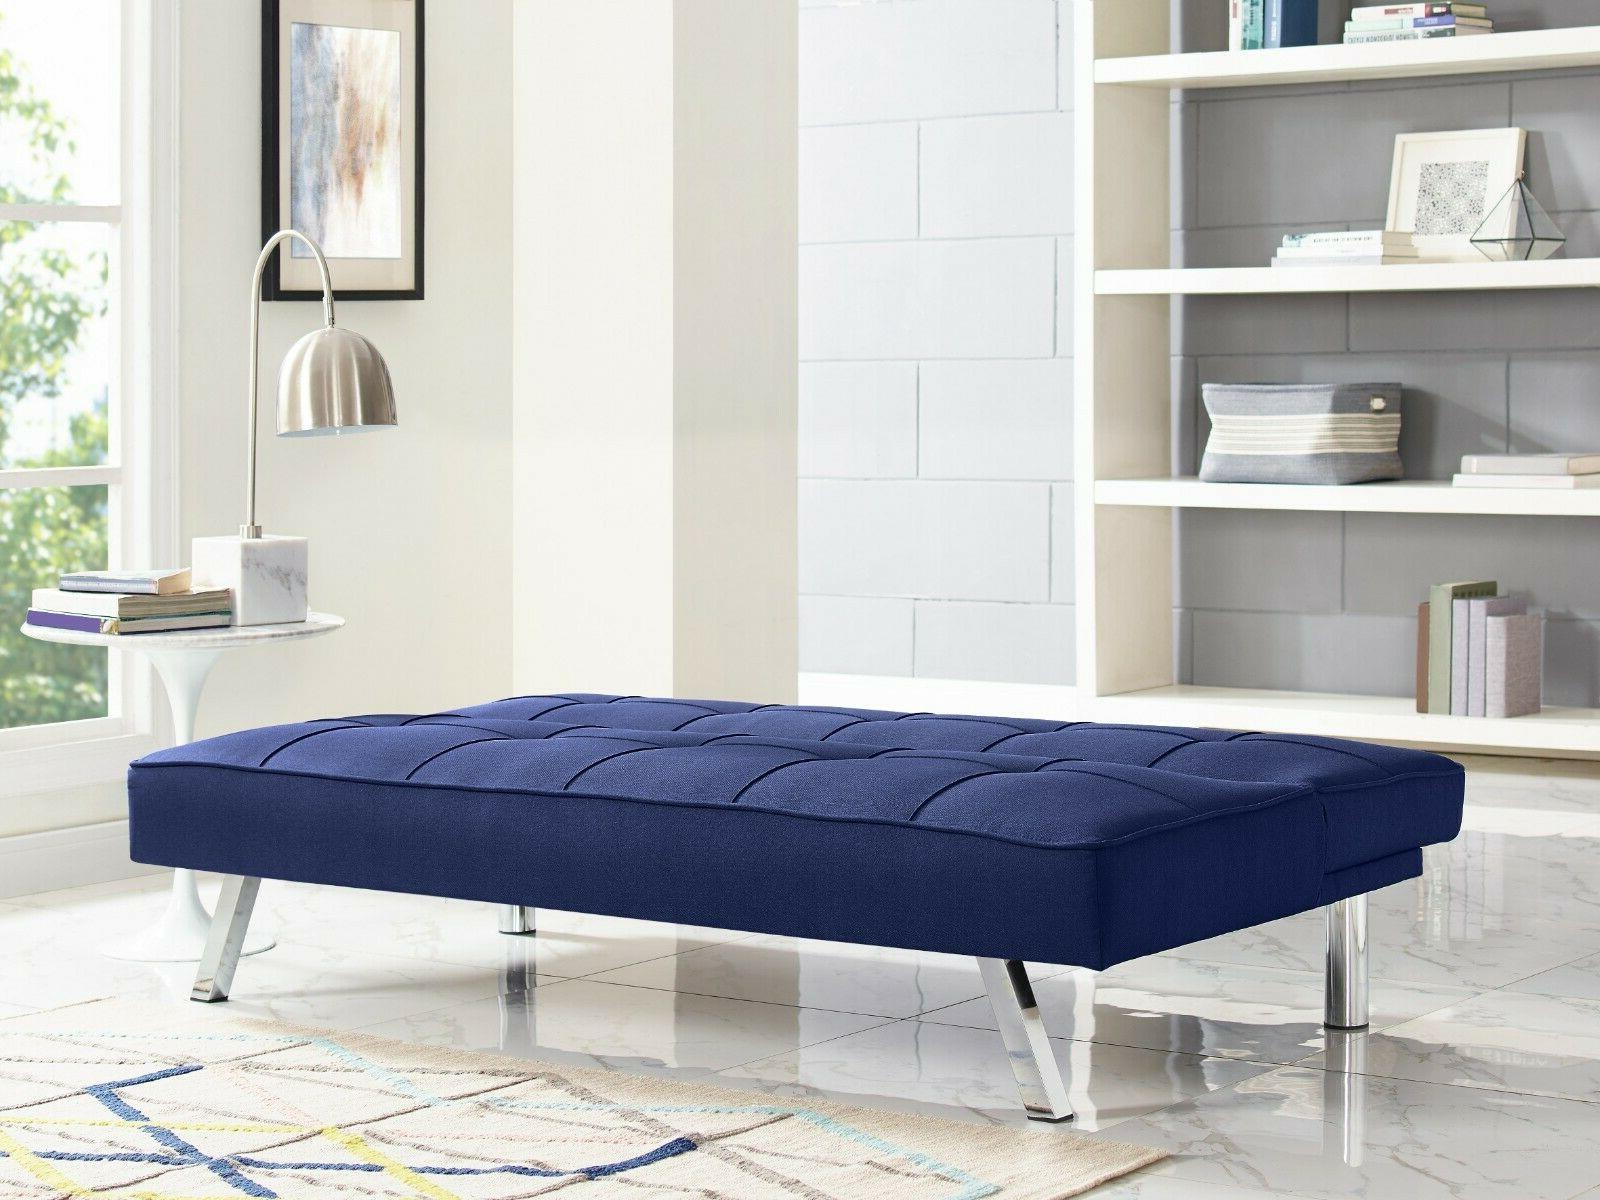 Serta Upholstery Fabric Sofa, Blue